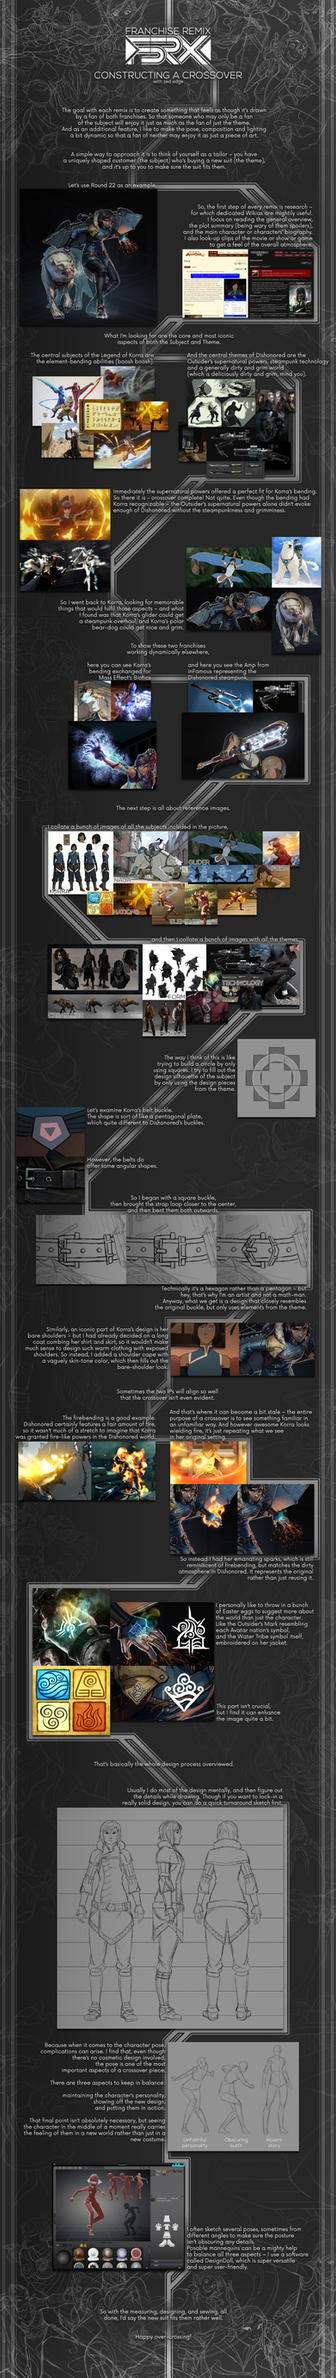 Franchise Remix - Tutorial by ZedEdge